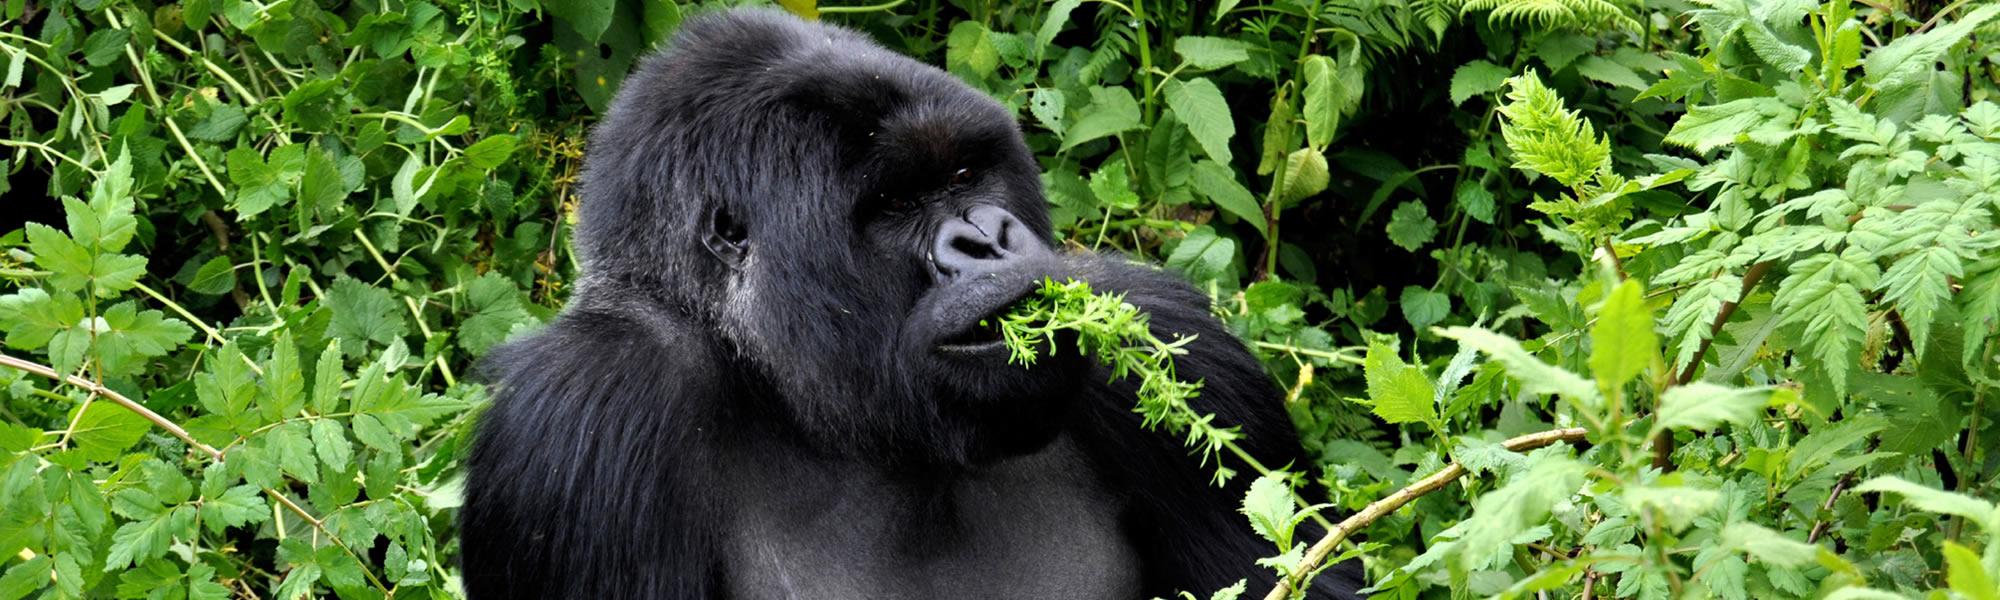 Uganda with an optional gorilla African trek to Rwanda' volcano national park and Virunga gorilla national park in Democratic republic of Congo